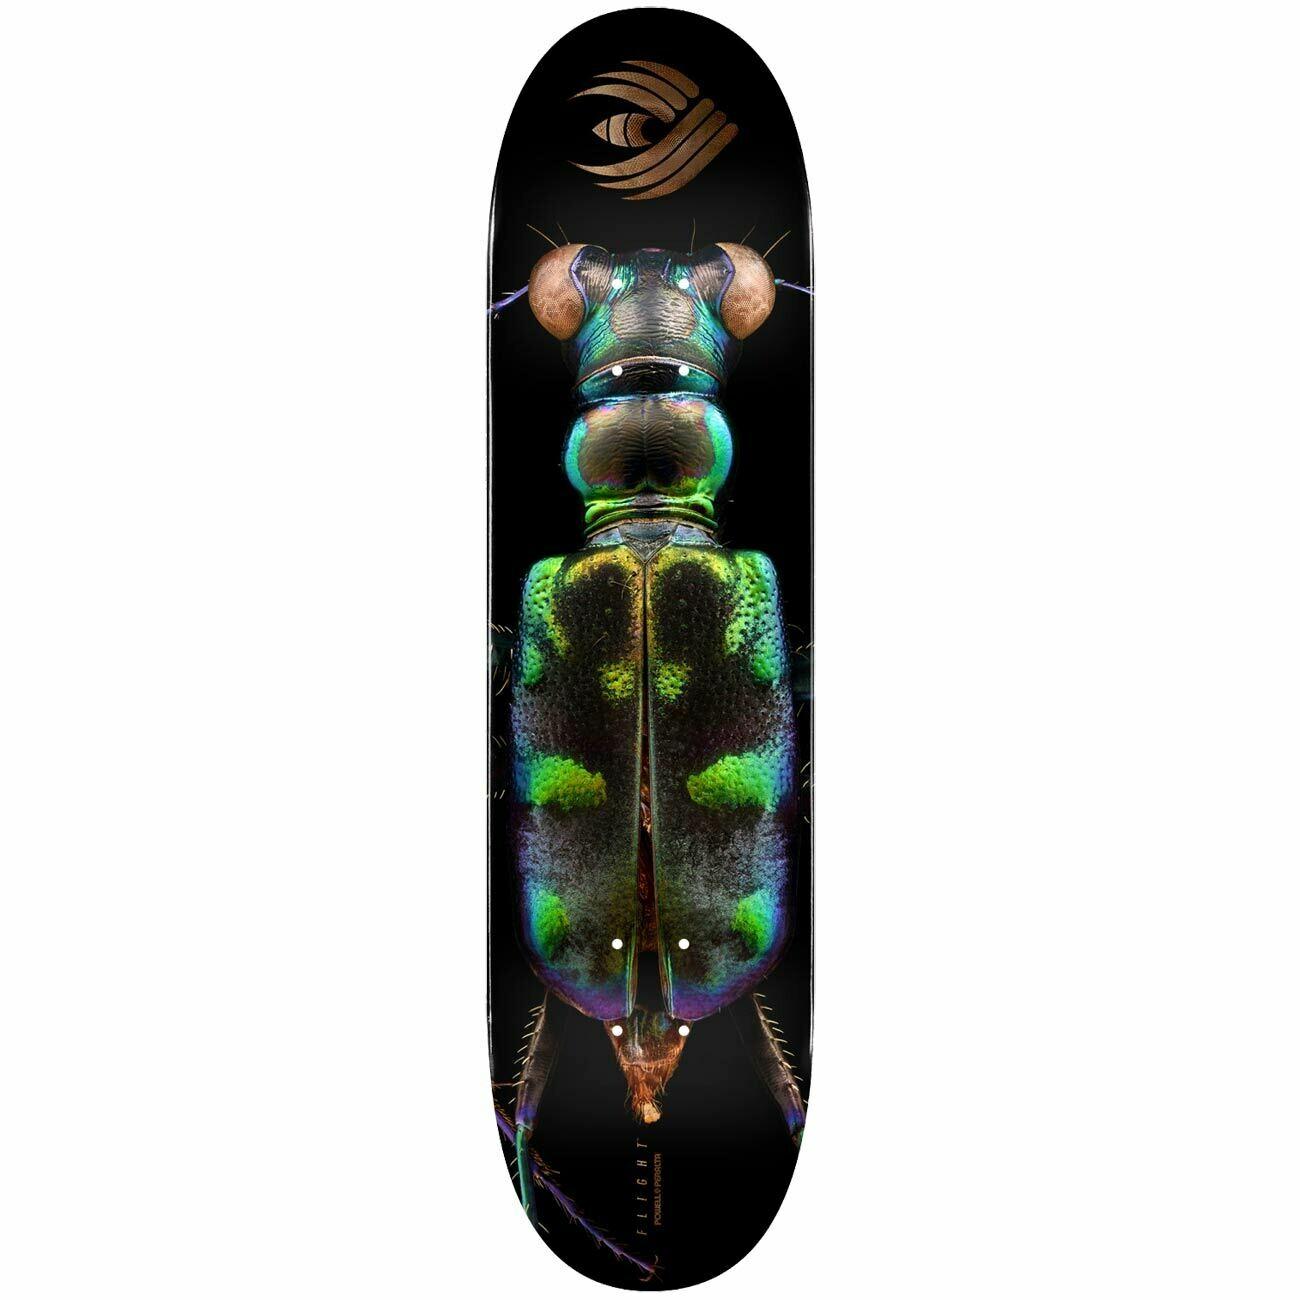 Powell Peralta Flight® Skateboard Deck BISS Tiger Beetle (8.25 x 31.95)